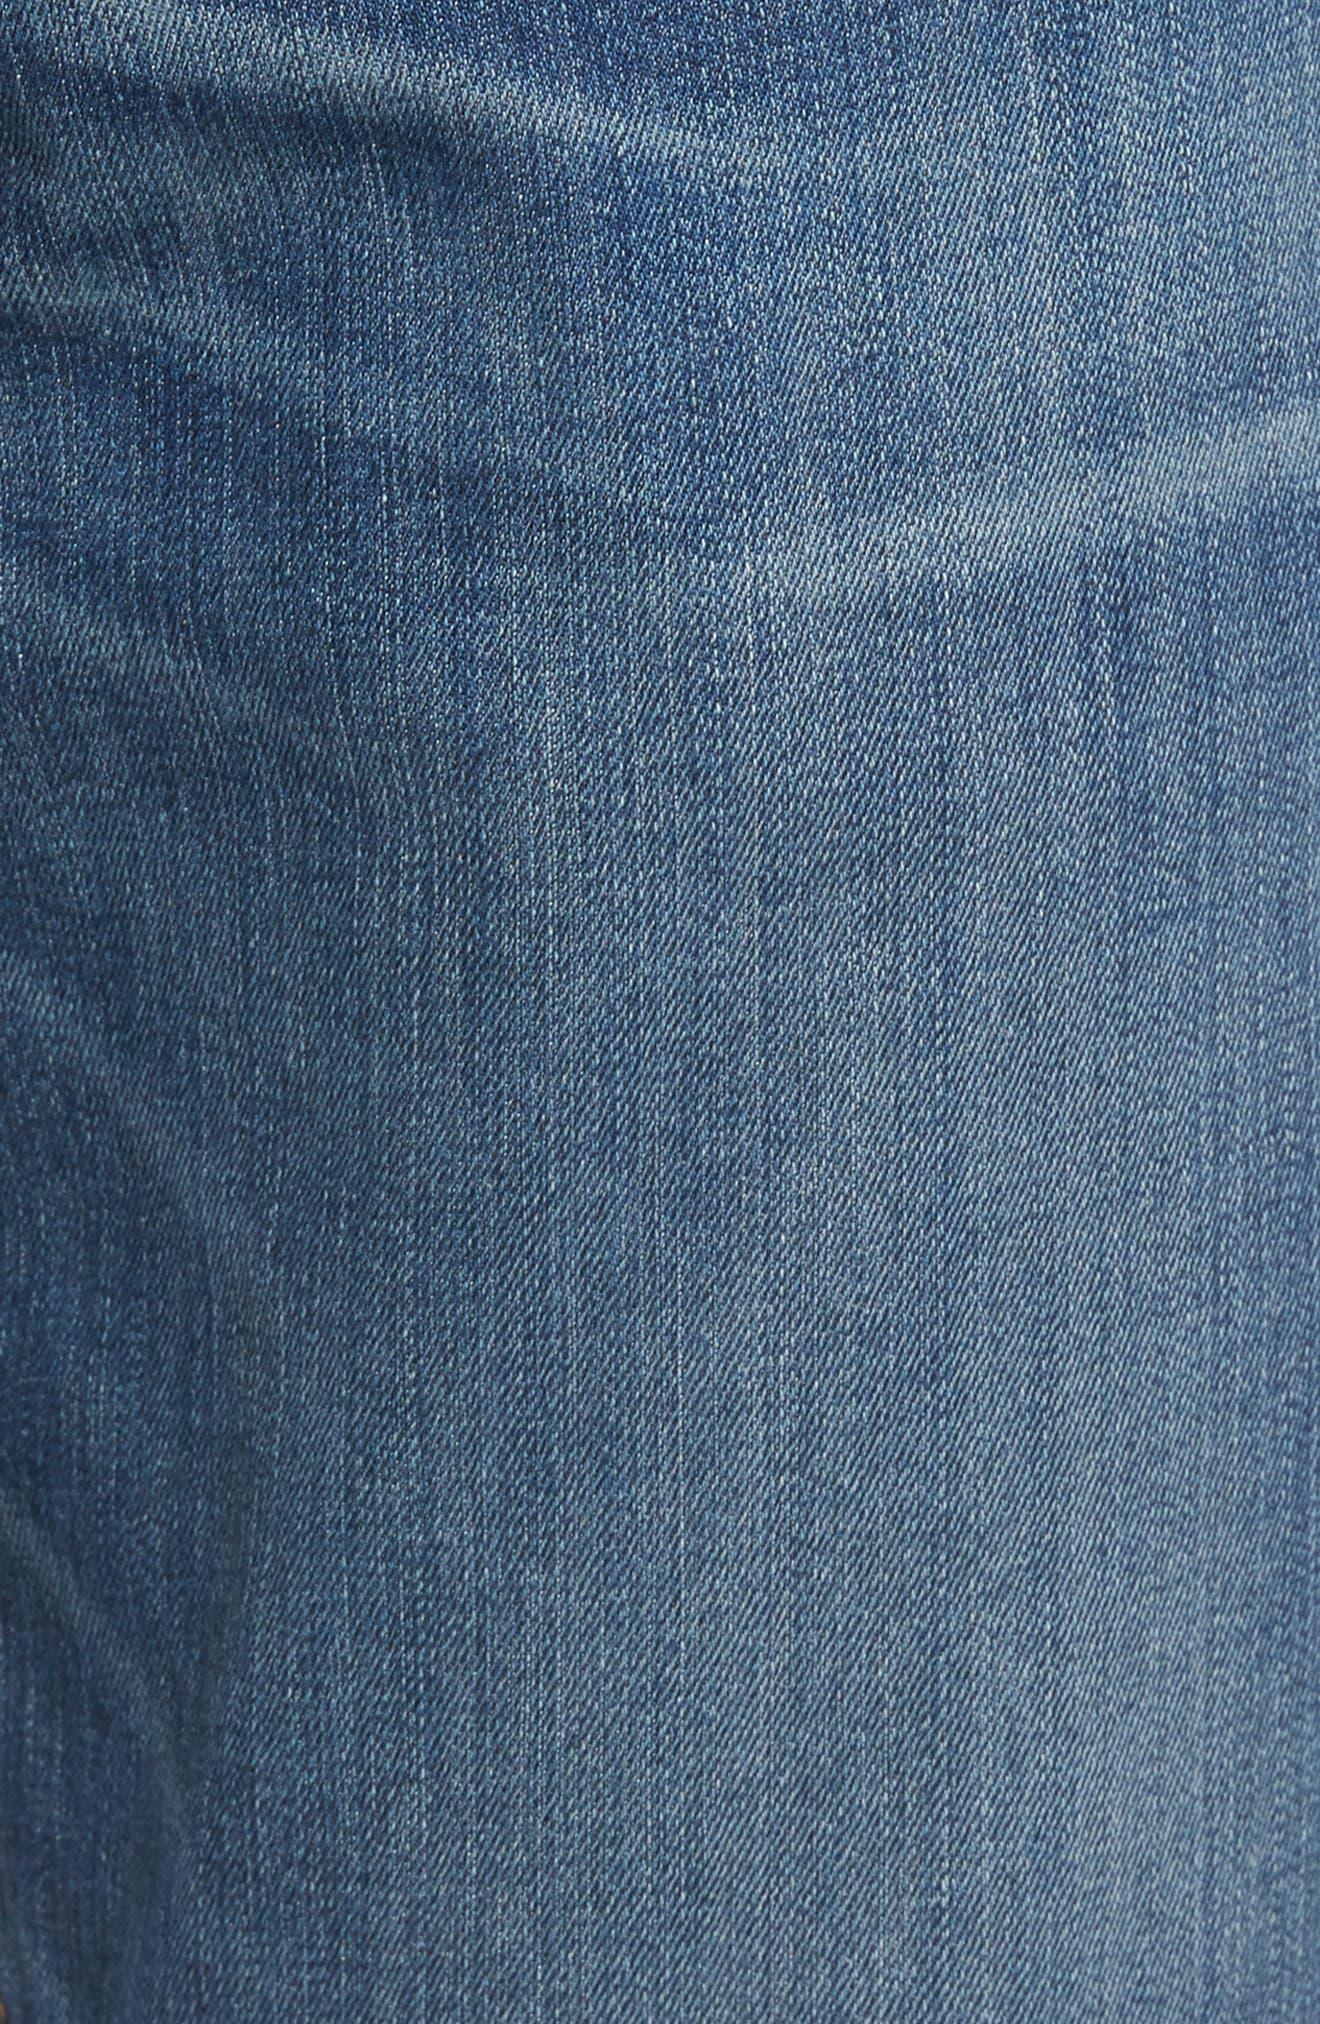 Legacy - Normandie Straight Leg Jeans,                             Alternate thumbnail 5, color,                             400